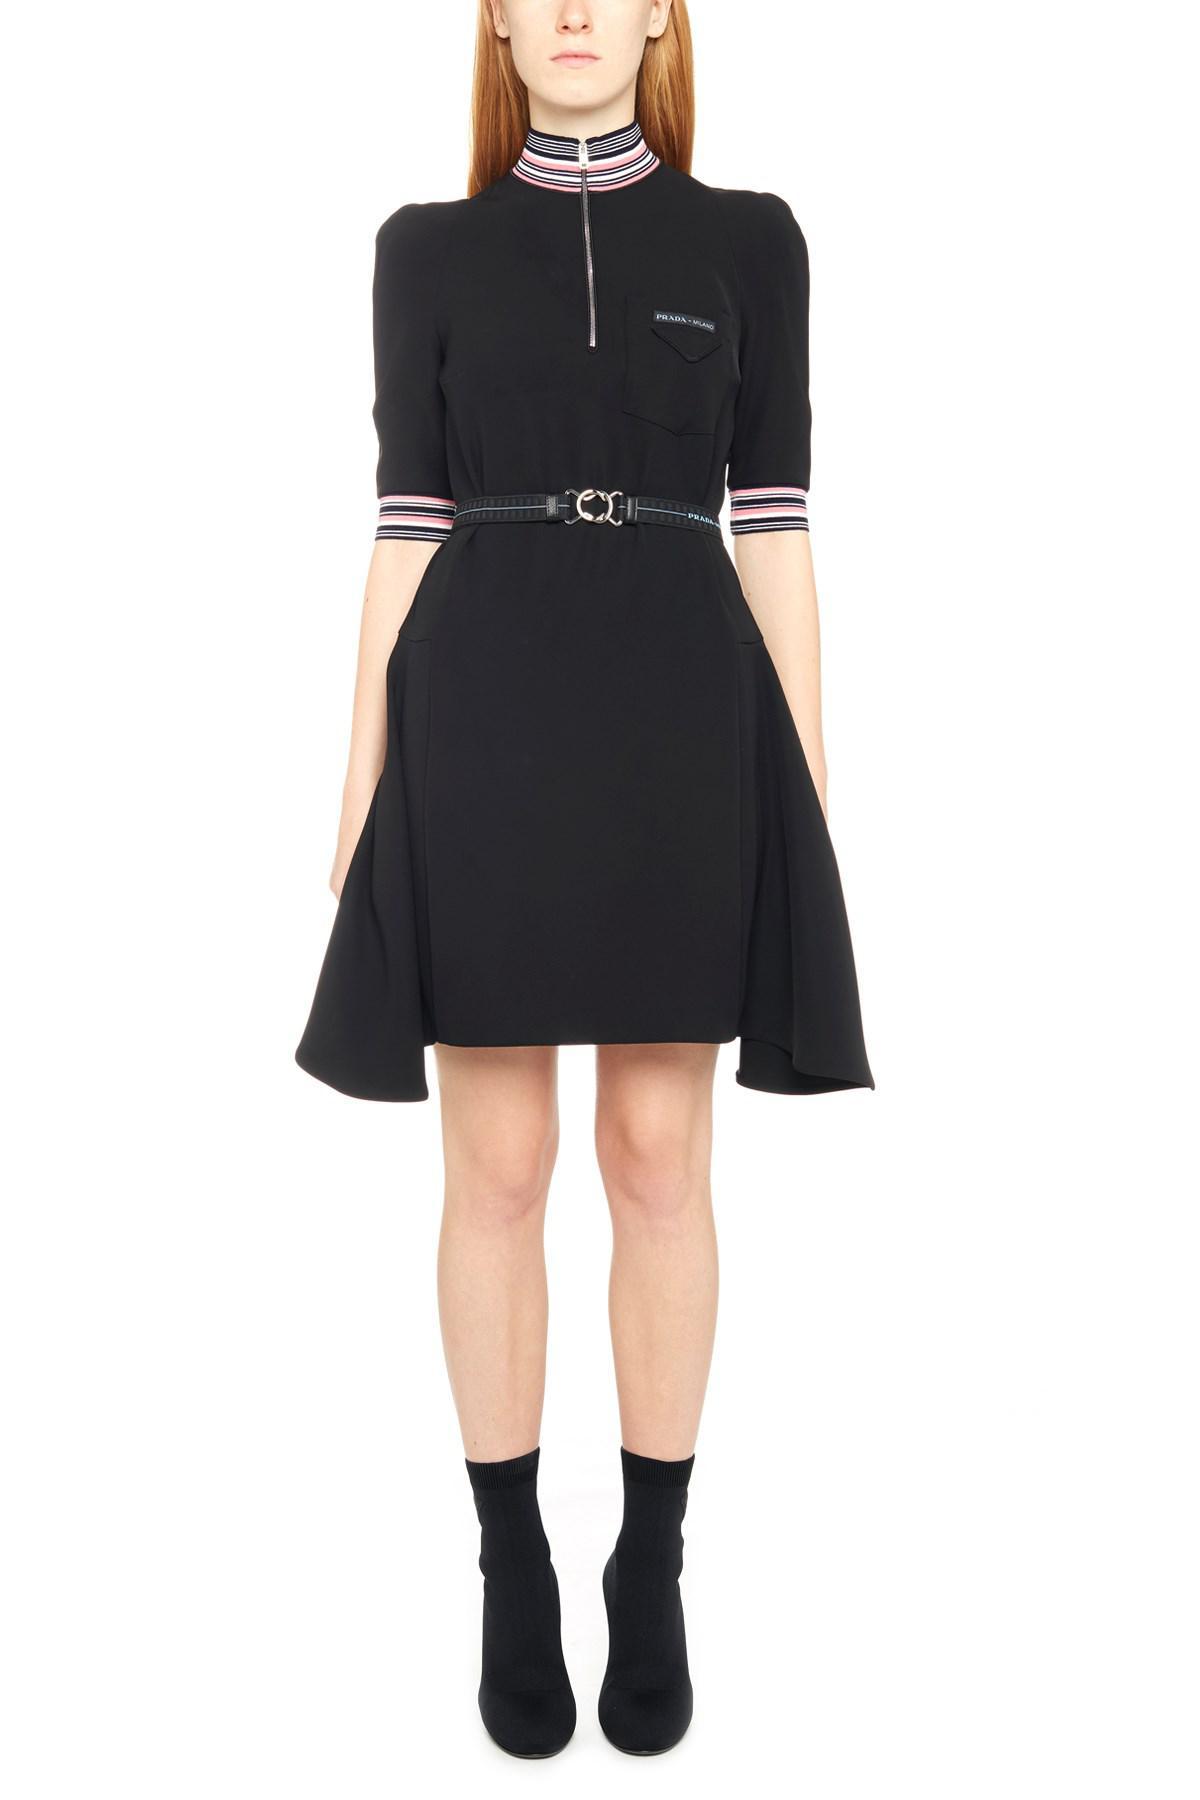 beba0ffd32 Lyst - Prada Tech Fabric Dress in Black